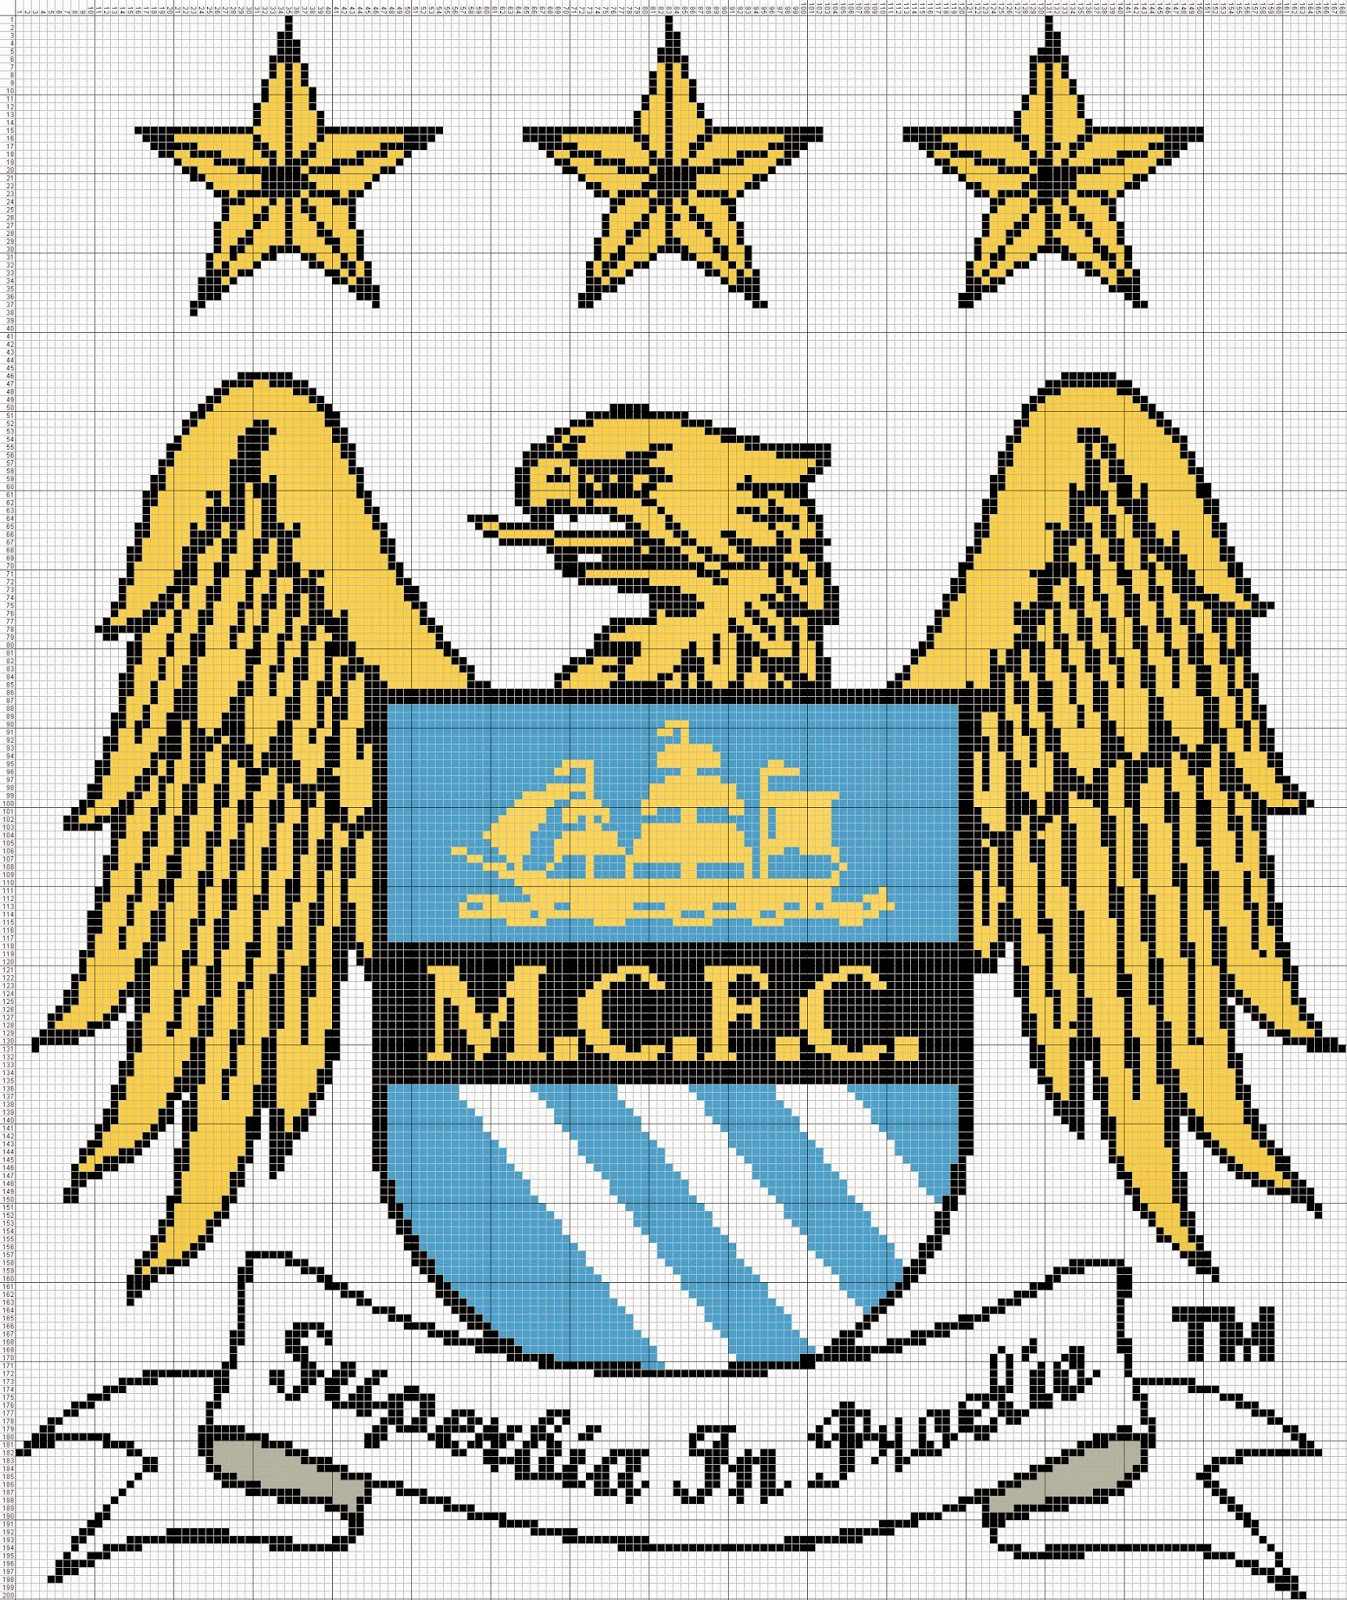 Gambar Pola Kristik Logo Manchester City FC - Inggris